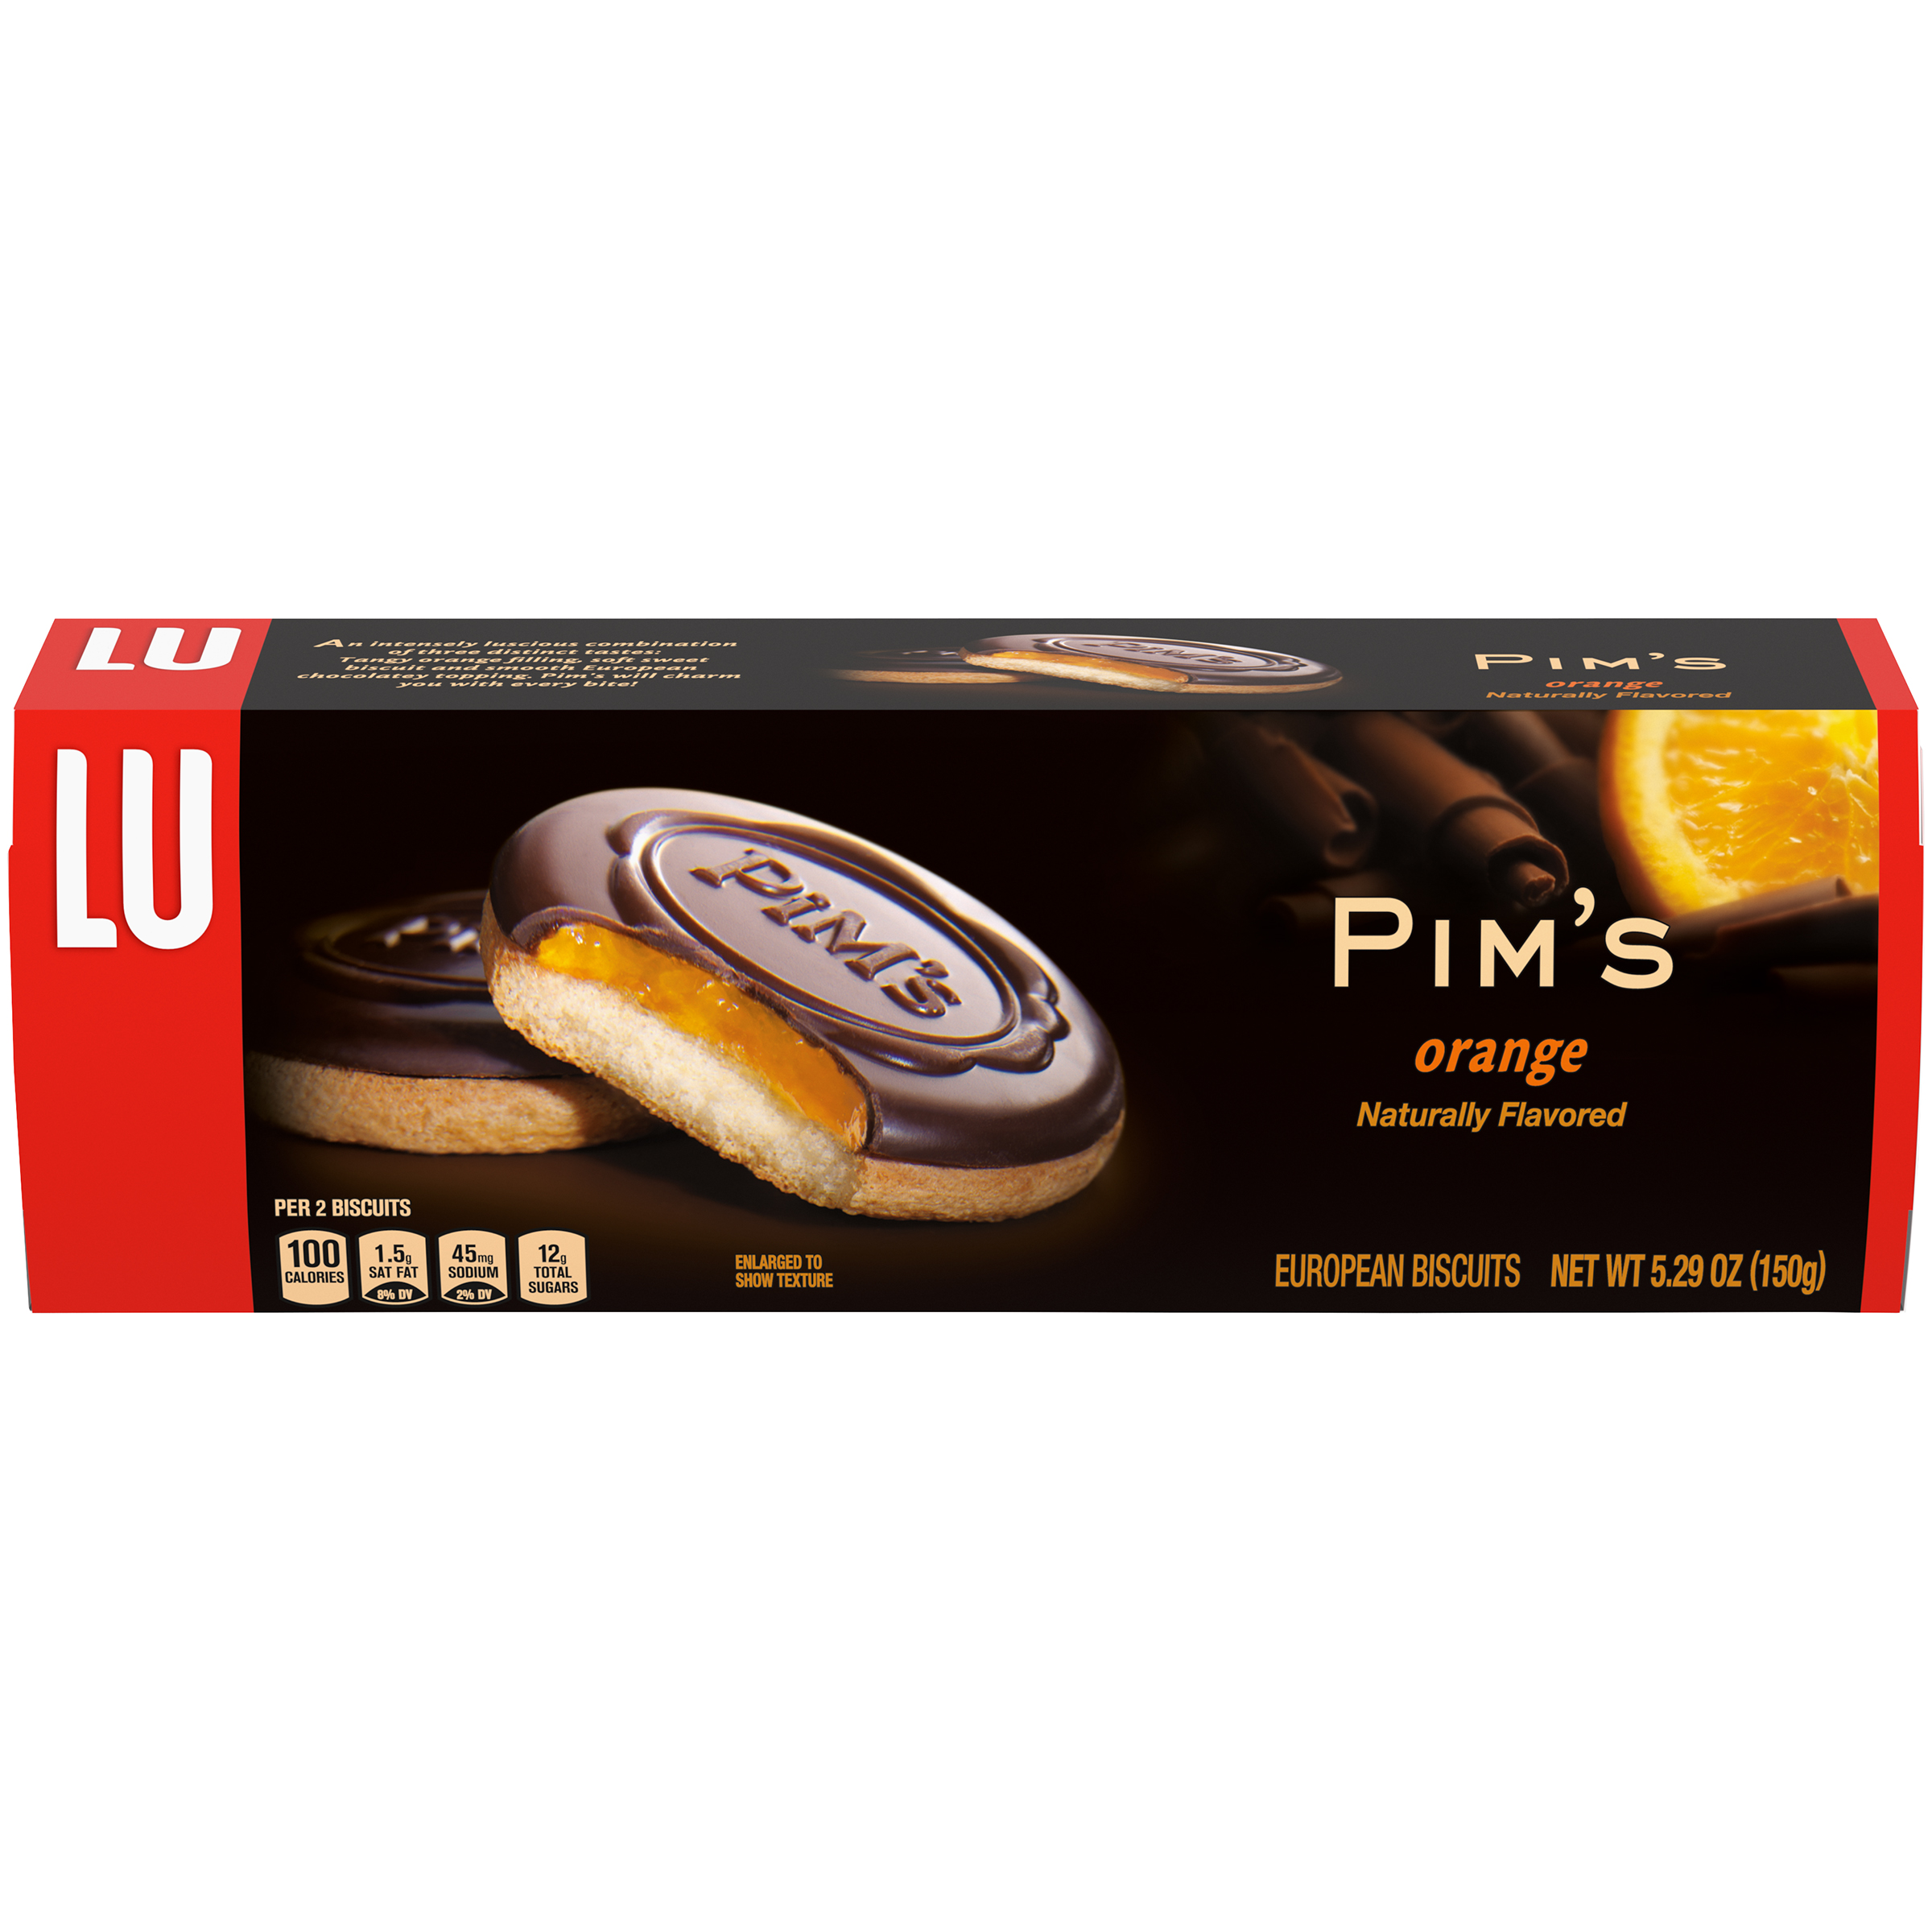 PIMS Cookies 5.29 oz